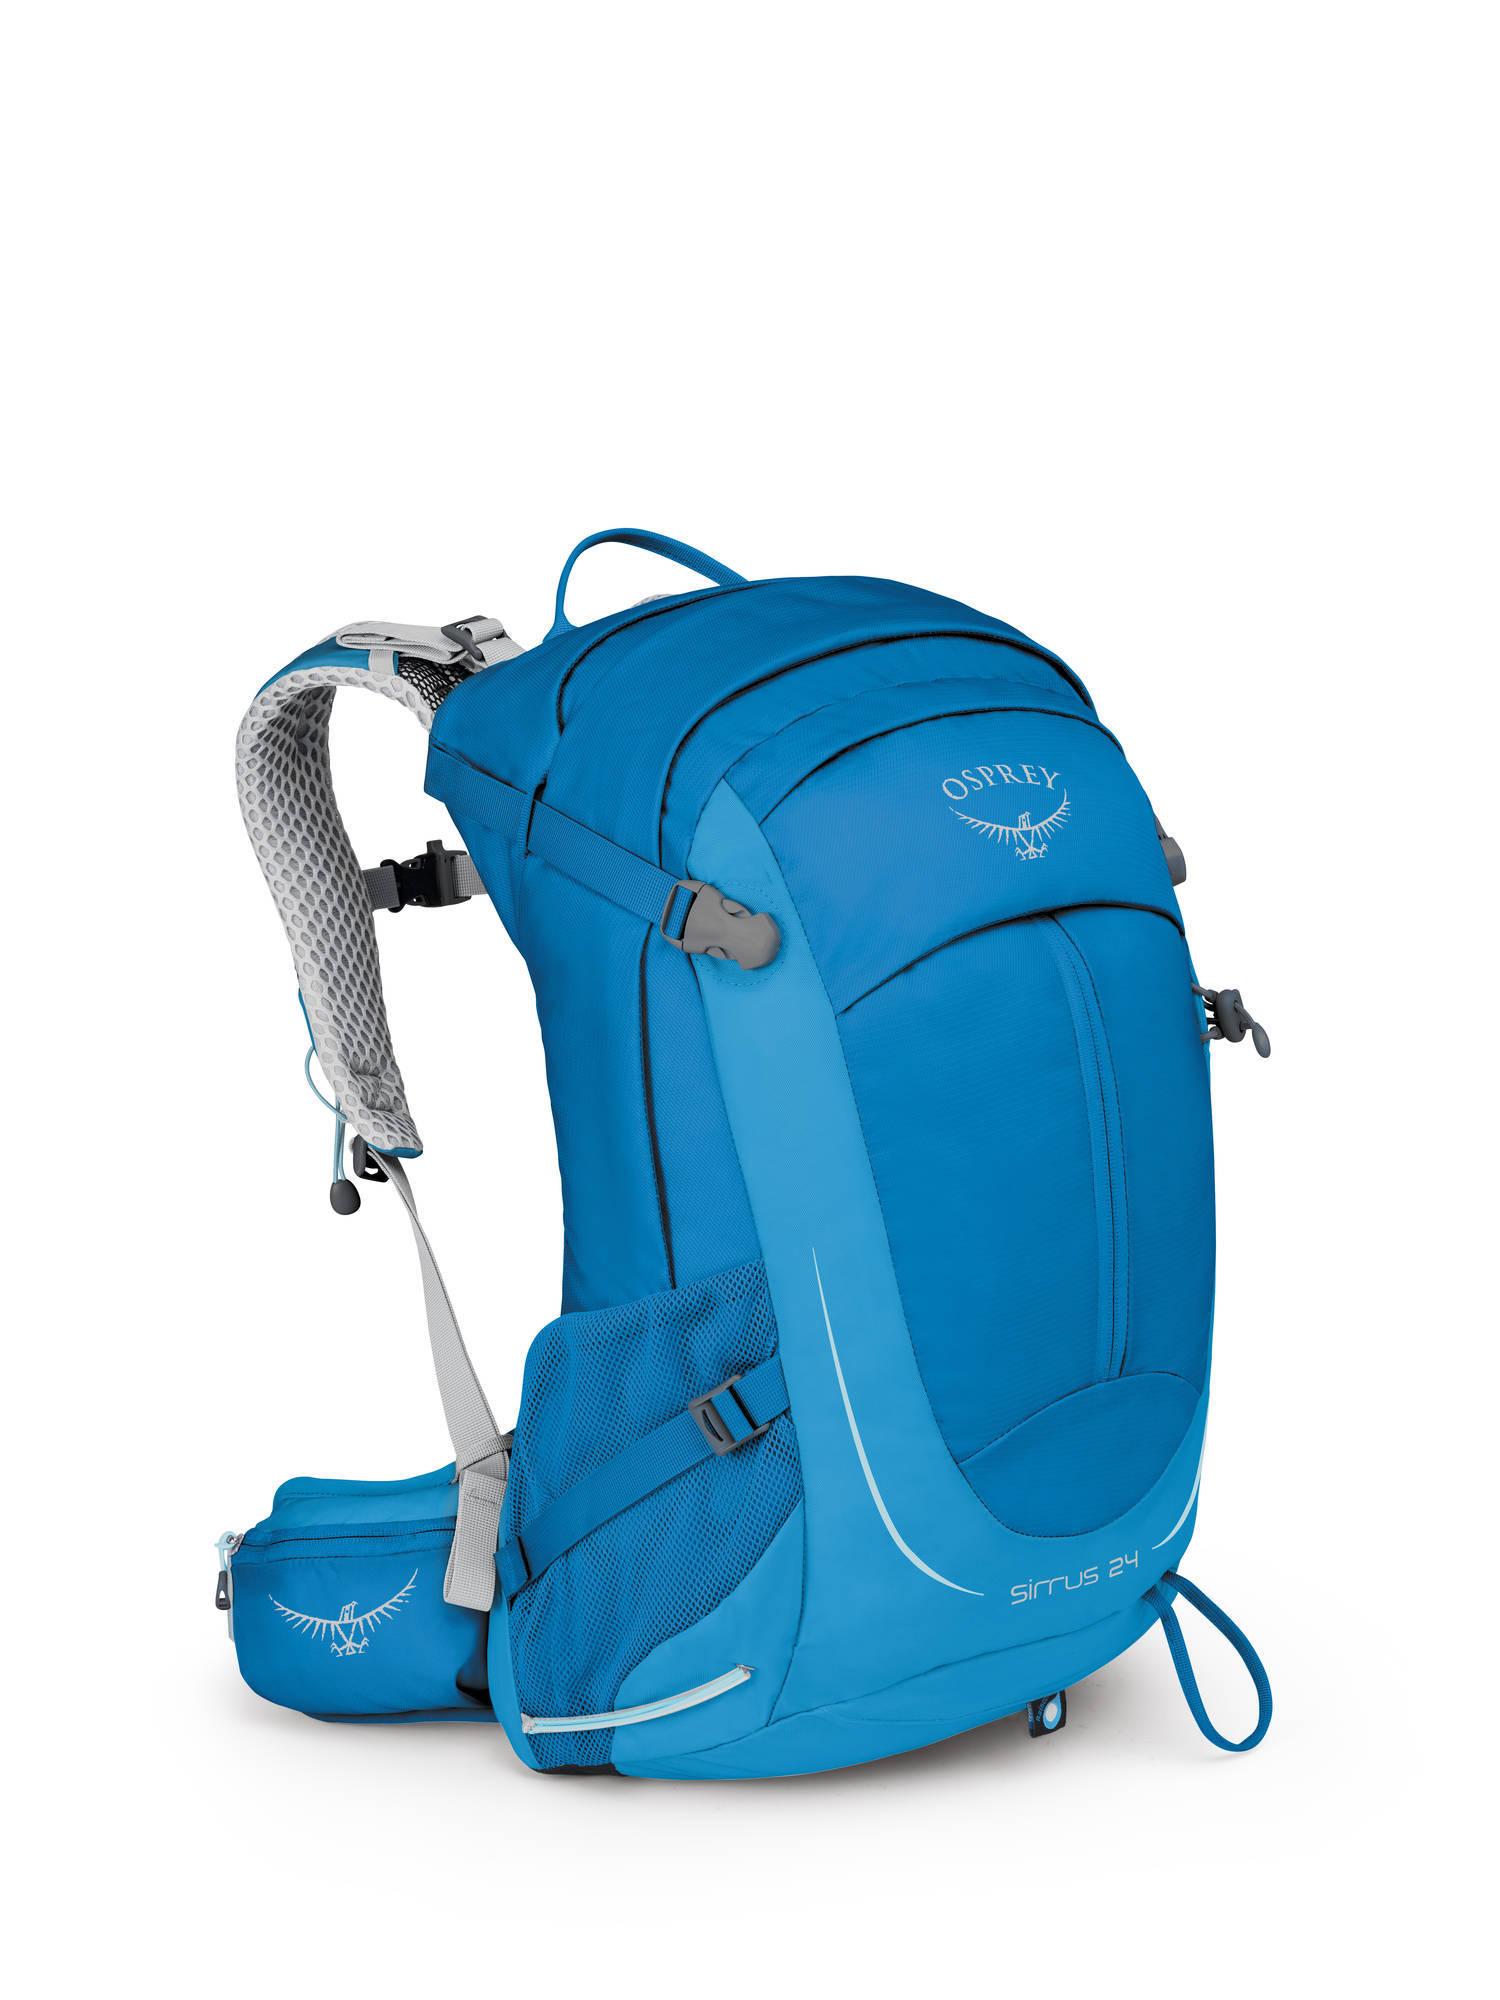 Туристические рюкзаки Рюкзак женский туристический Osprey Sirrus 24 Summit Blue Sirrus_24_S17_Side_Summit_Blue_web.jpg